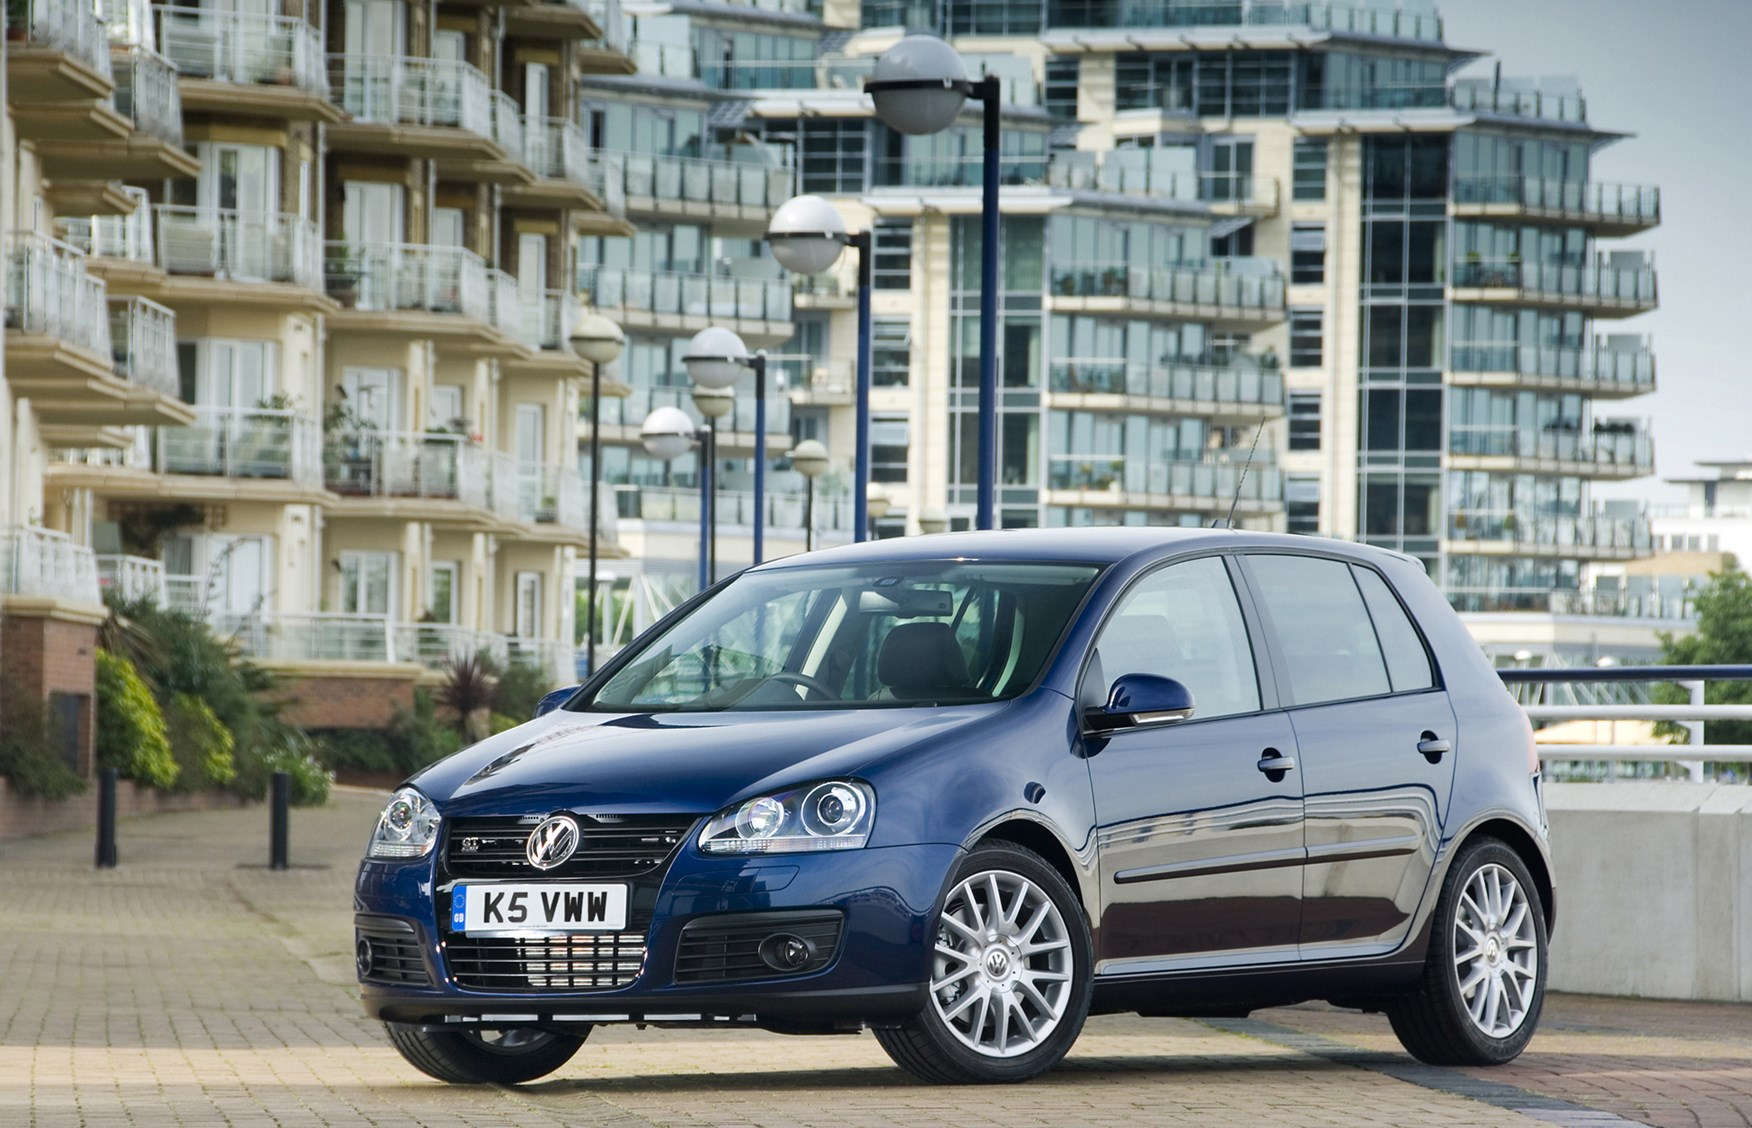 Used Volkswagen Golf Hatchback (2004 - 2008) Review   Parkers